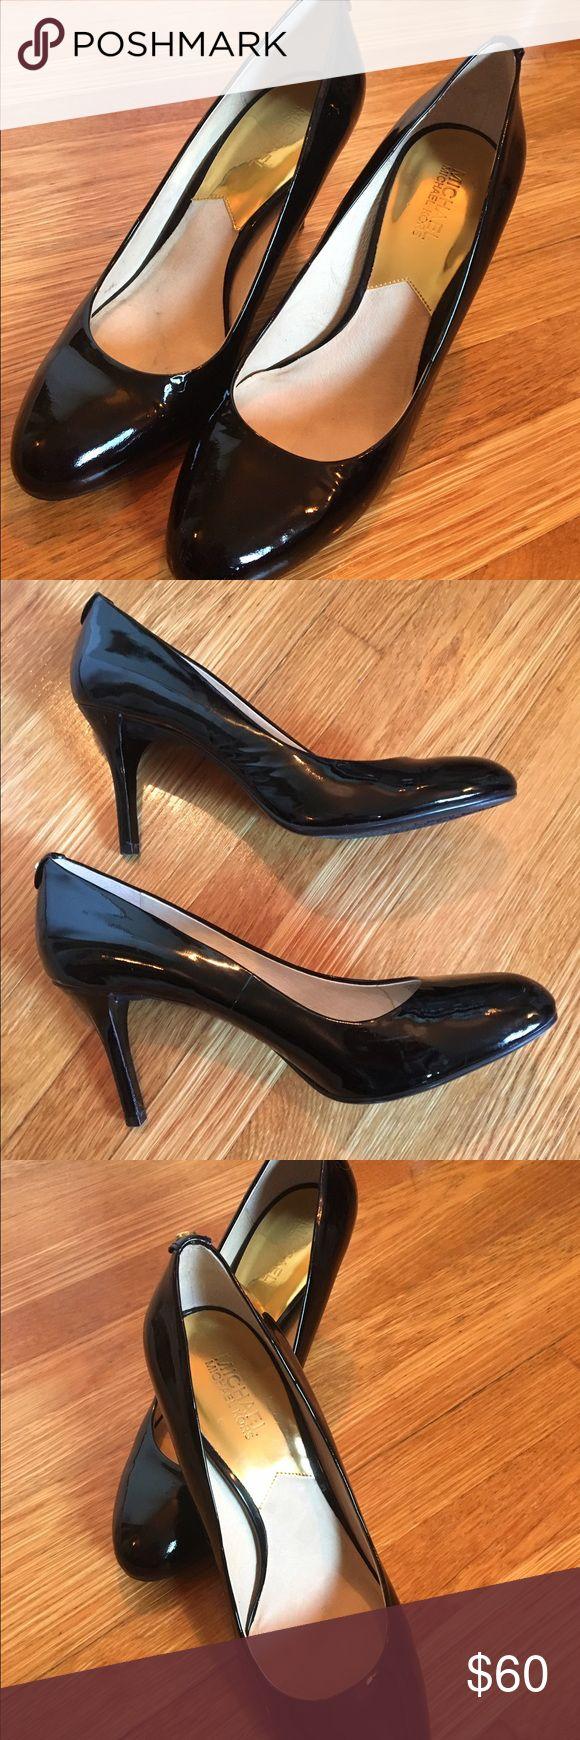 Michael Kors Black Patent Leather Pumps, size 10. Worn once KORS Michael Kors Shoes Heels